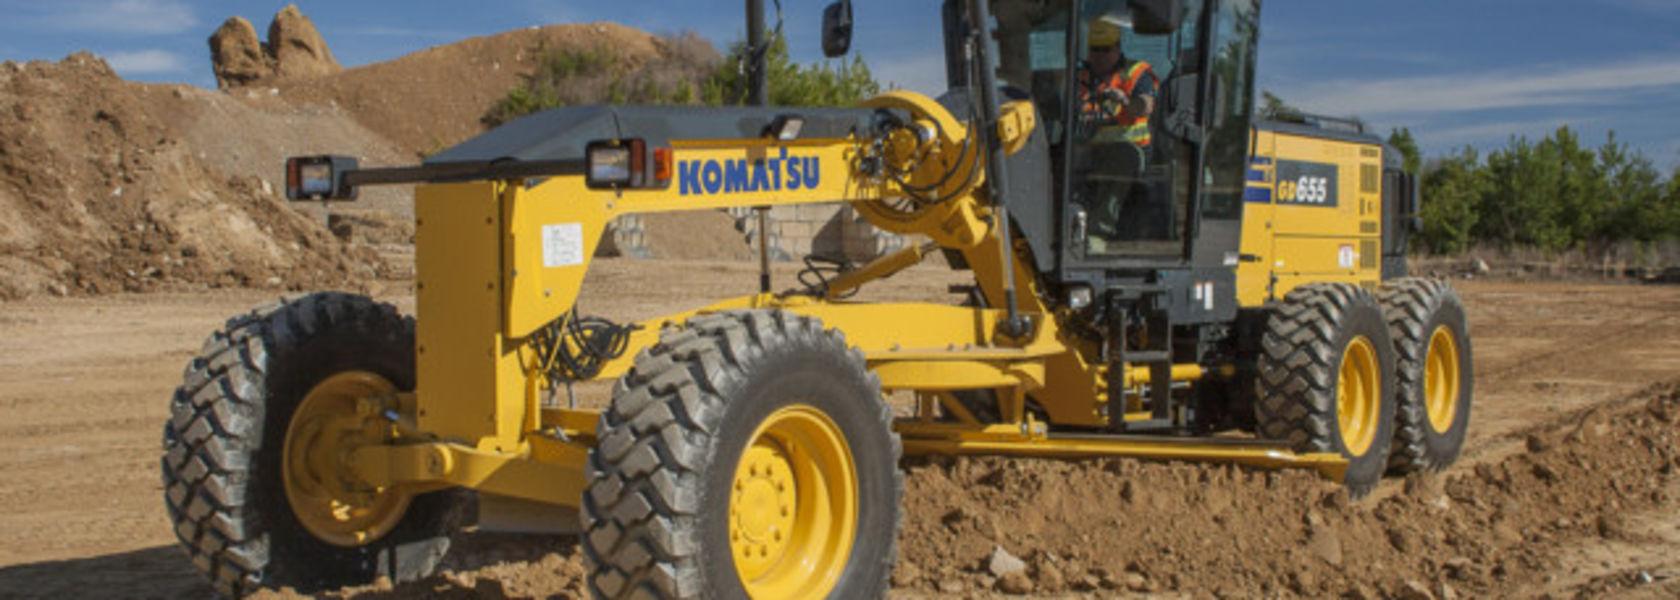 Komatsu introduces GD655-6 motor grader - Mining Magazine